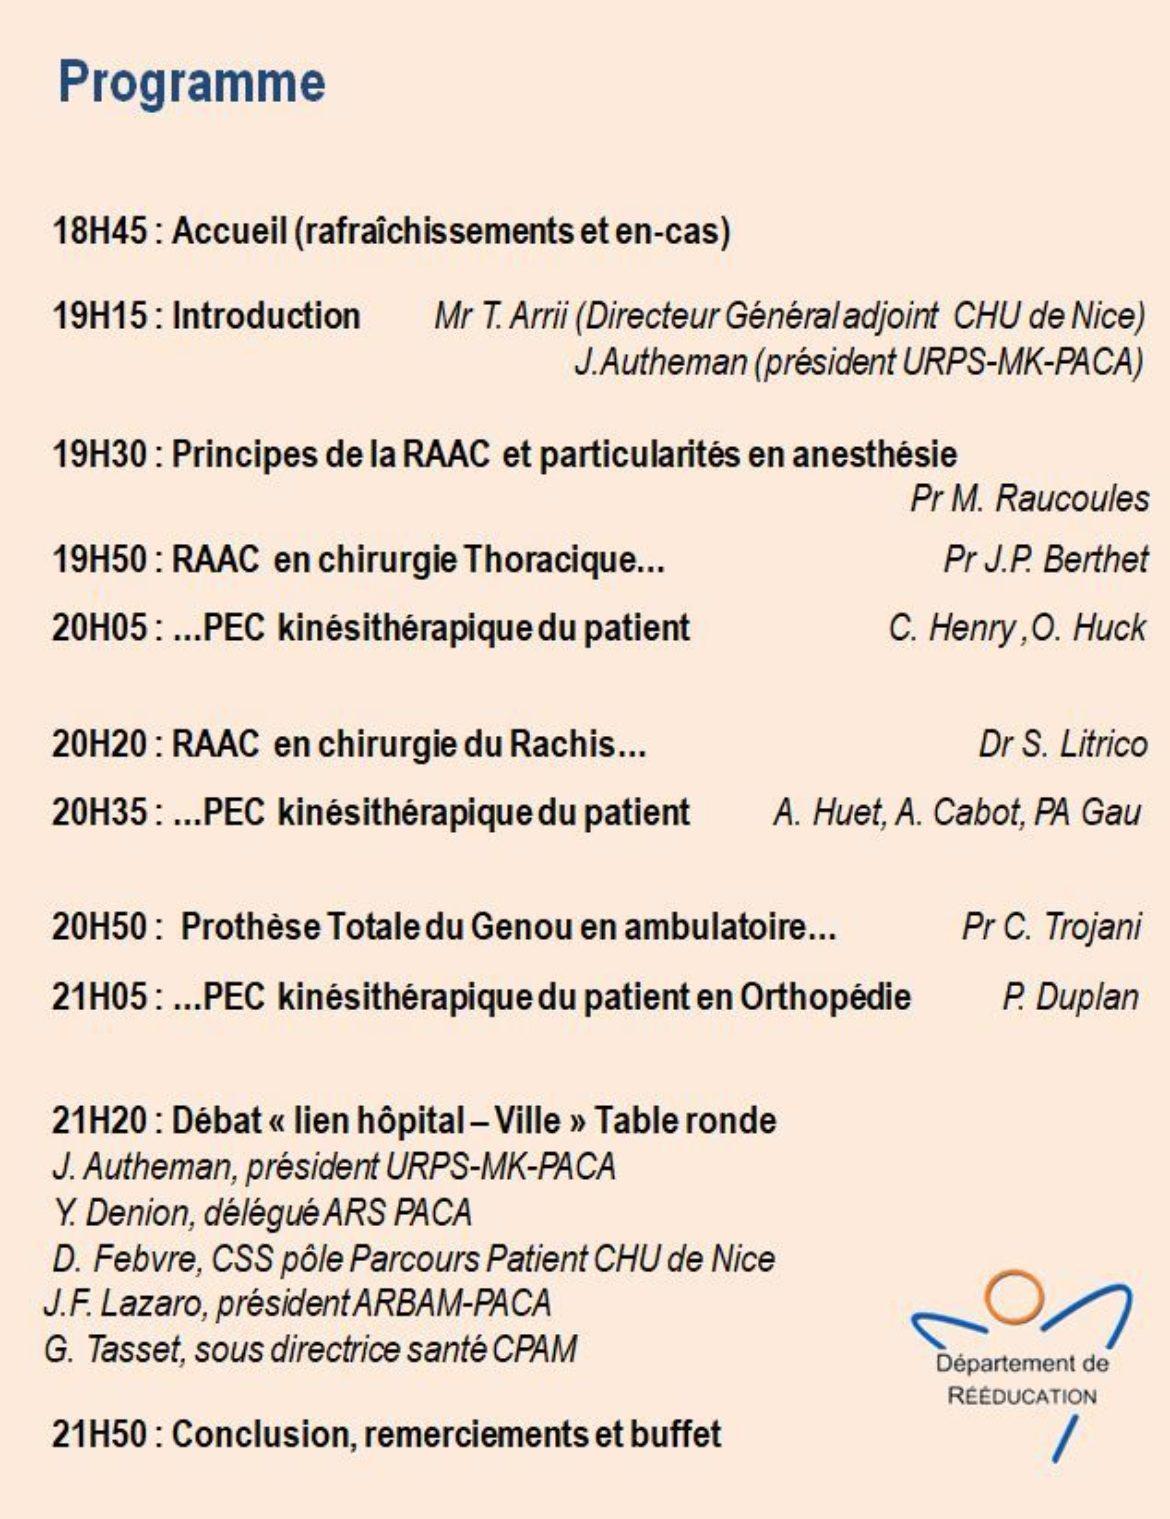 Programme Soiree Raac 06 06 2019